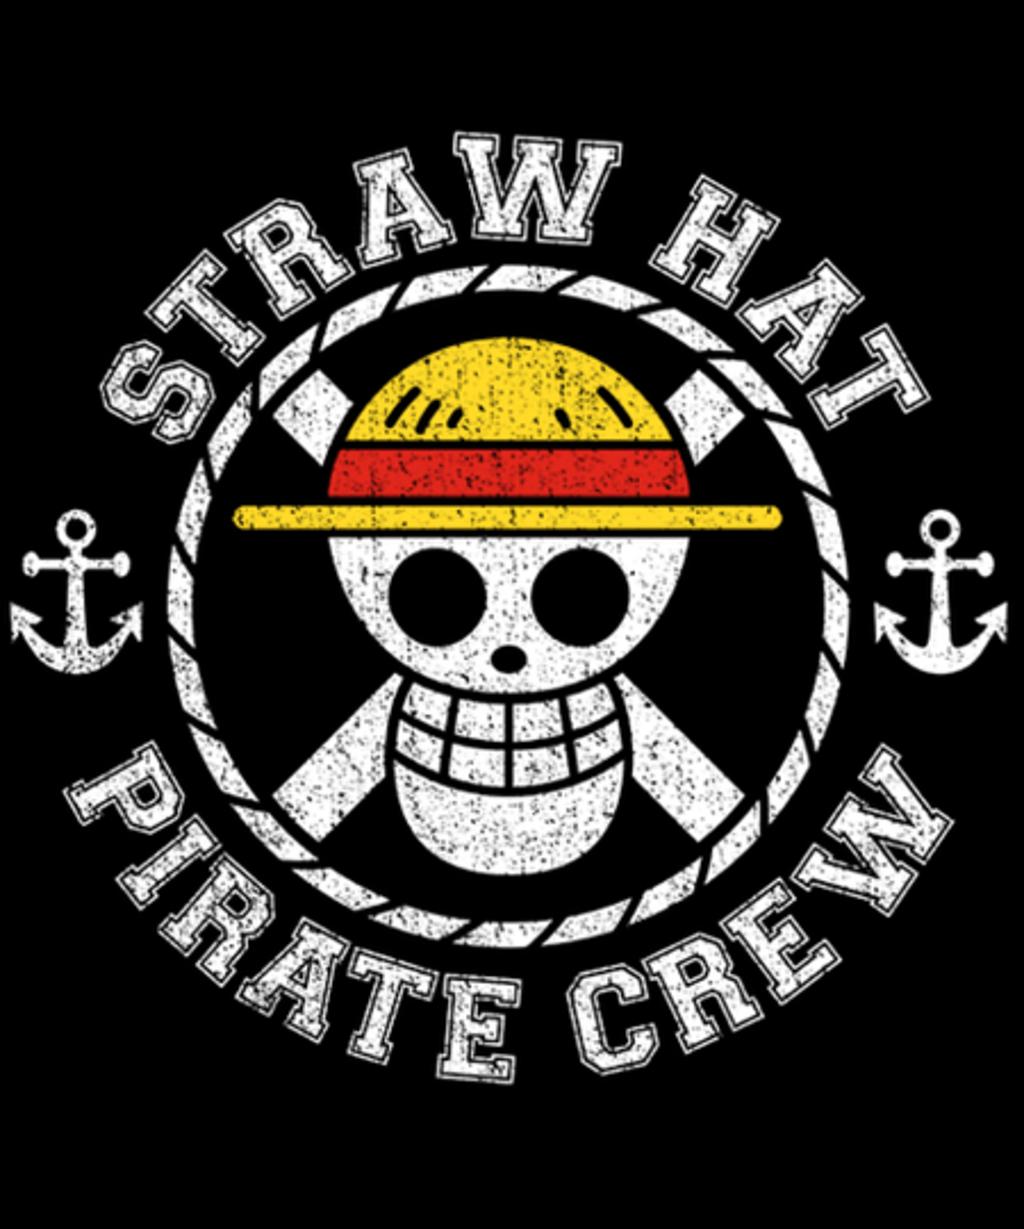 Qwertee: Straw Hat Gang